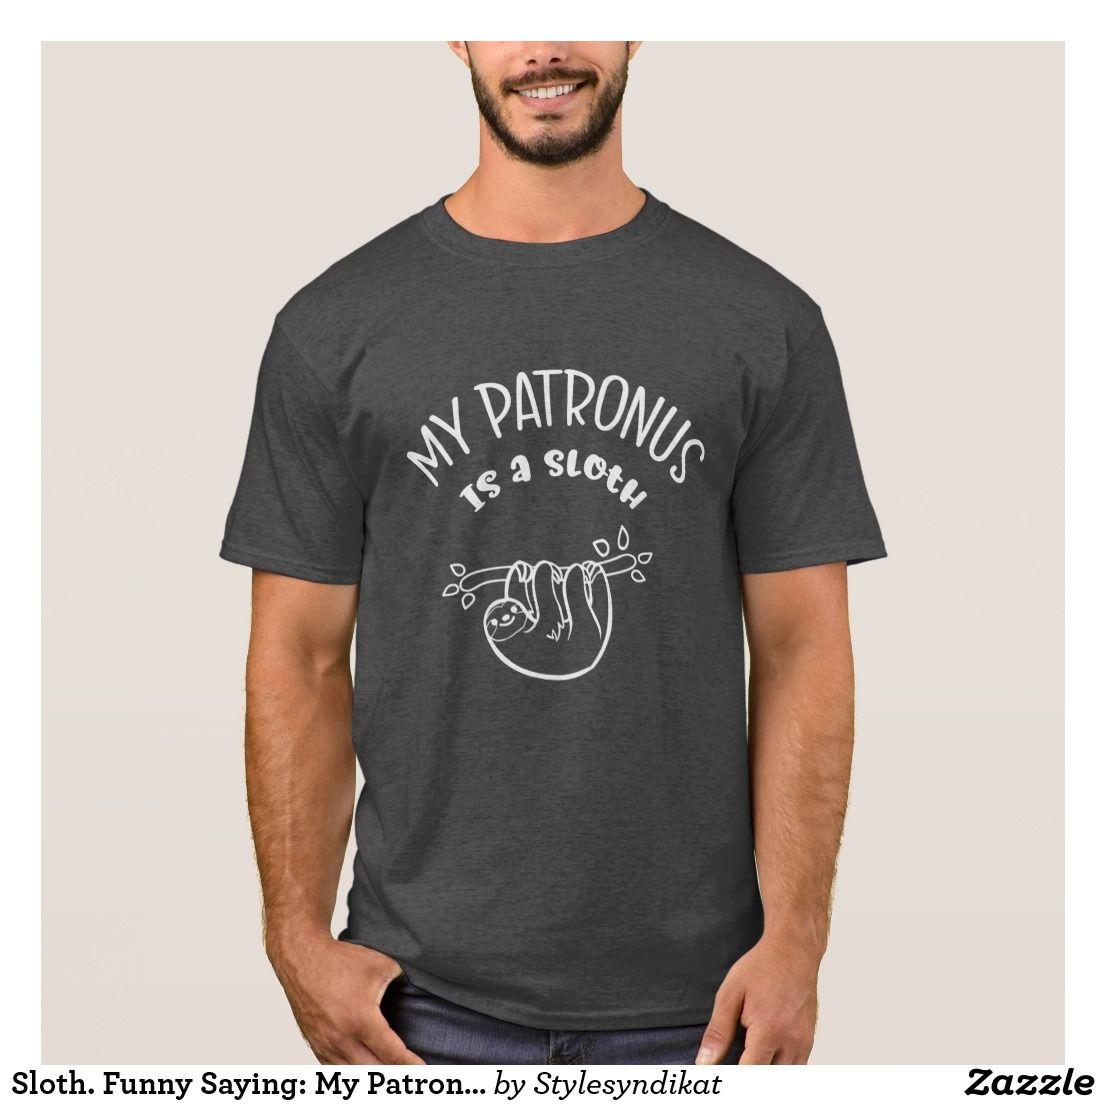 Sloth. Funny Saying: My Patronus is a Sloth. Nerdy T Shirt